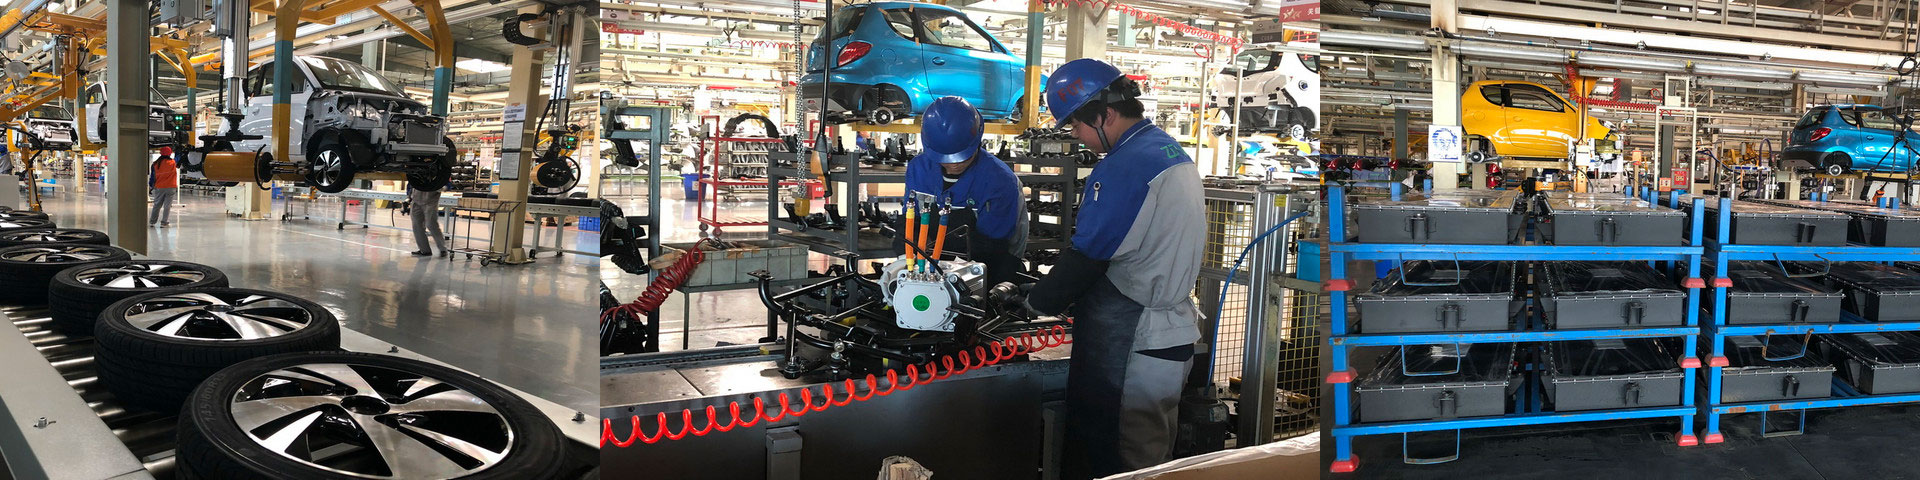 fabrica de coches eléctricos Zhidou